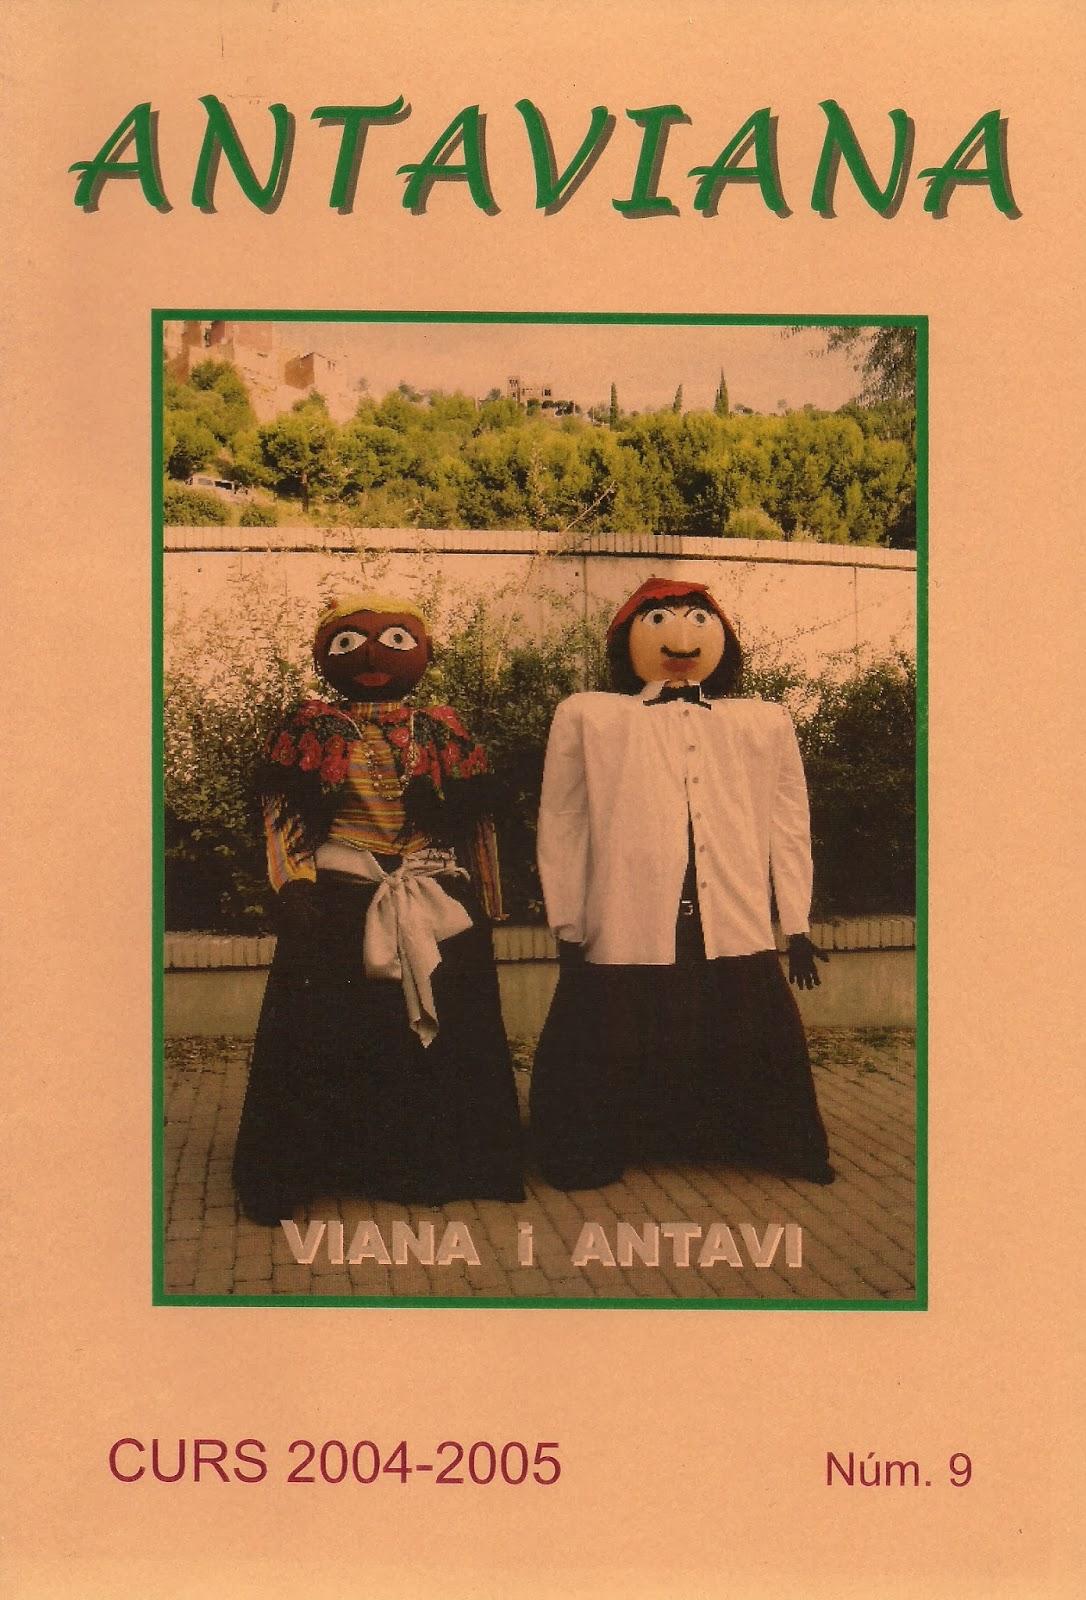 http://issuu.com/blocsdantaviana/docs/revista_antaviana_n___9__2004-2005_